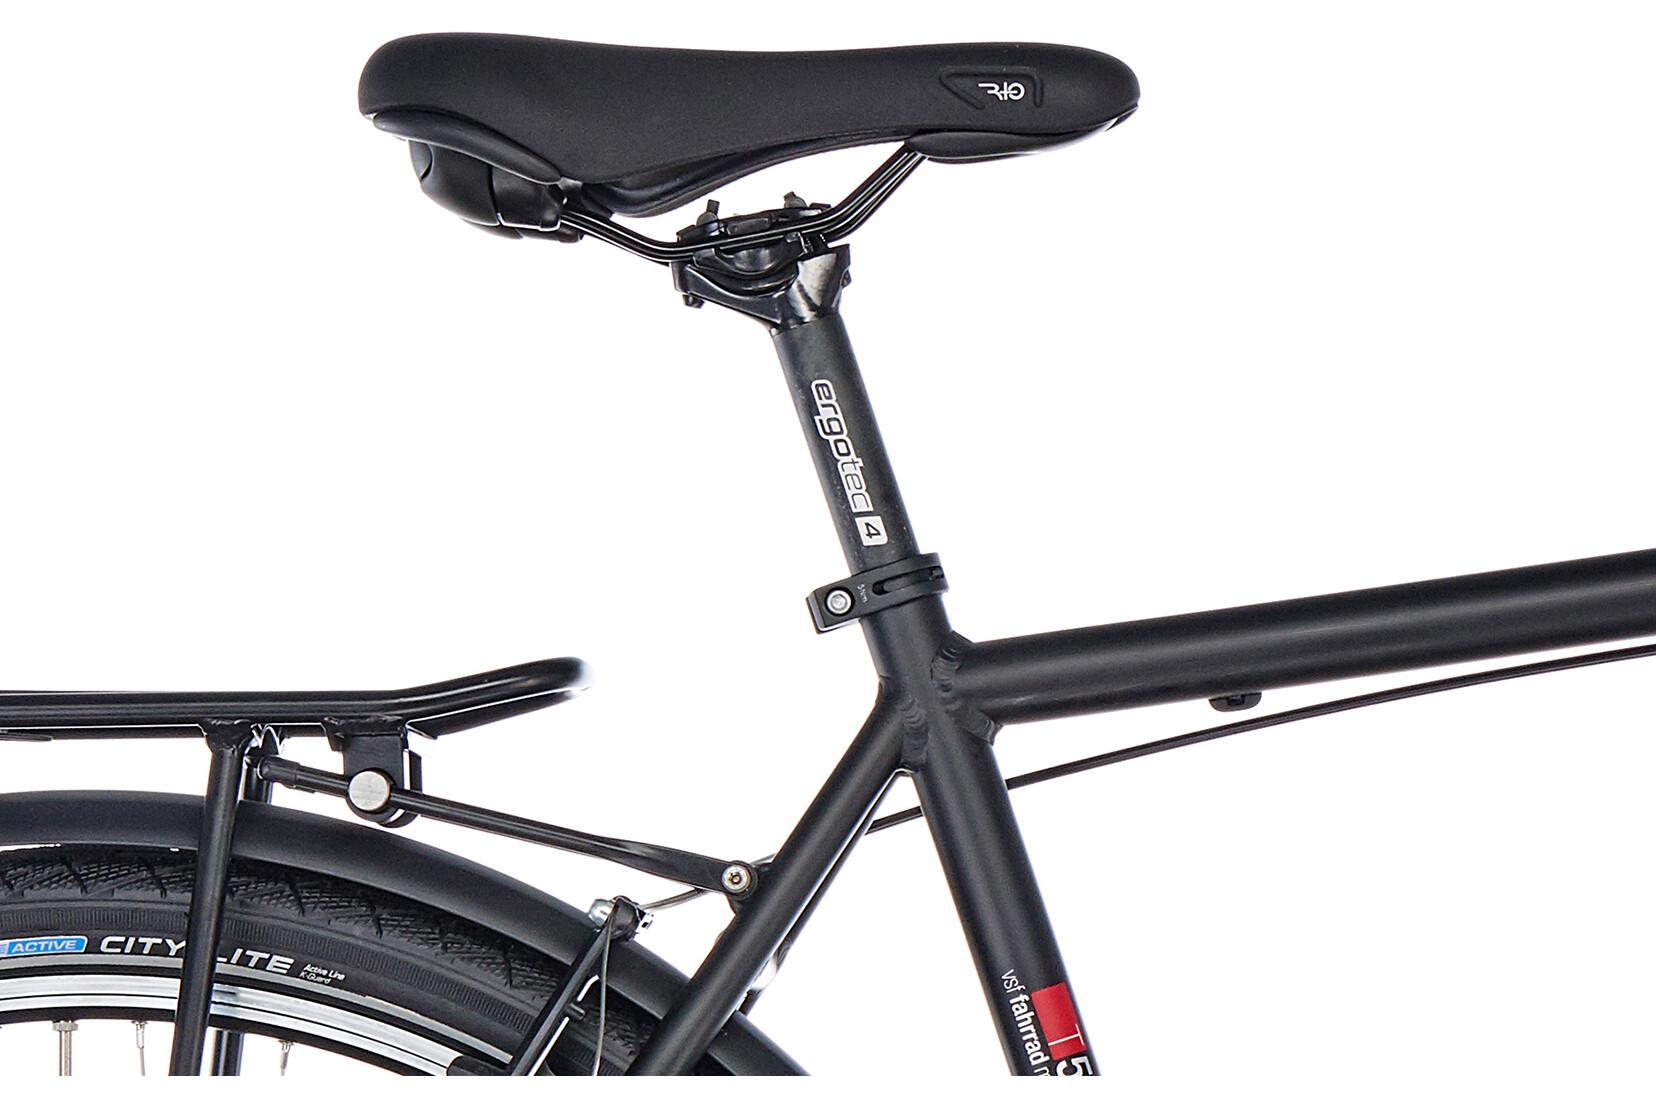 cc5b3438706 vsf fahrradmanufaktur T-50 Touring Bike Diamond Nexus 7-speed RT black